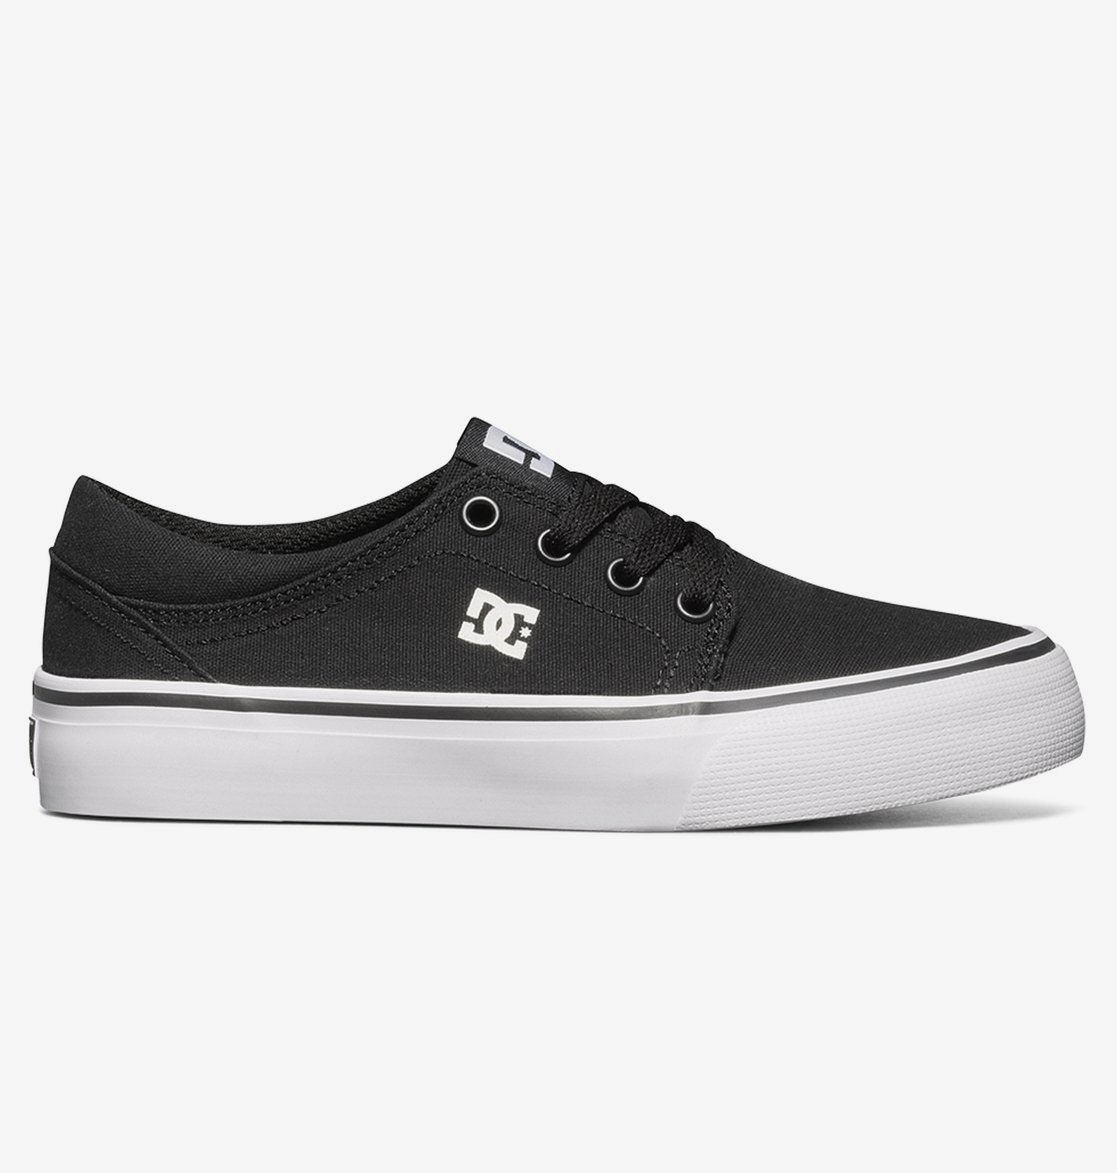 low priced c6e46 e20e8 Trase TX - Schuhe für Jungen